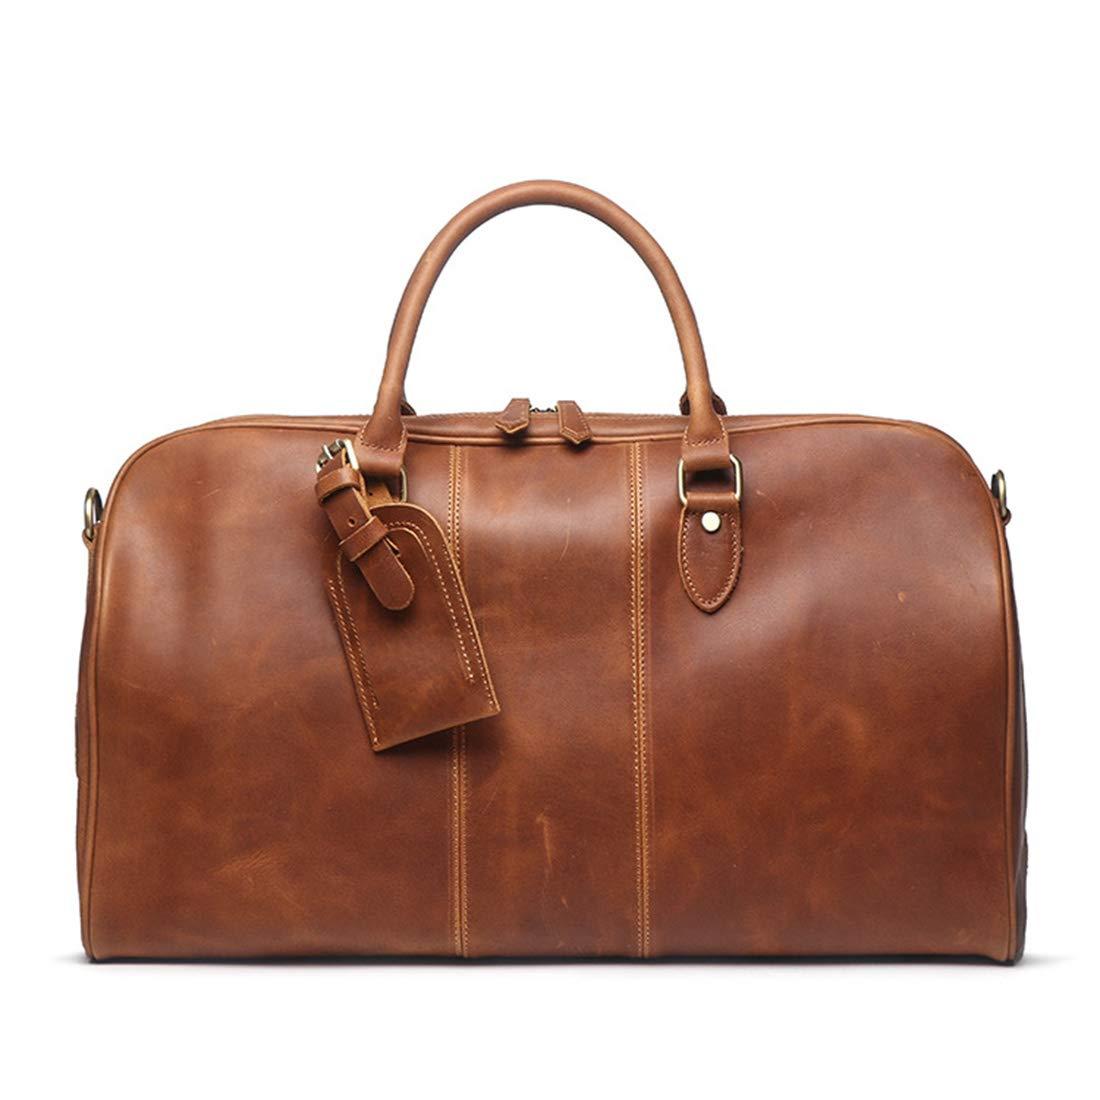 Color : Brown KRPENRIO Mens Leather Handbags Women Shoulder Messenger Bags Large Capacity Travel Duffel Bag